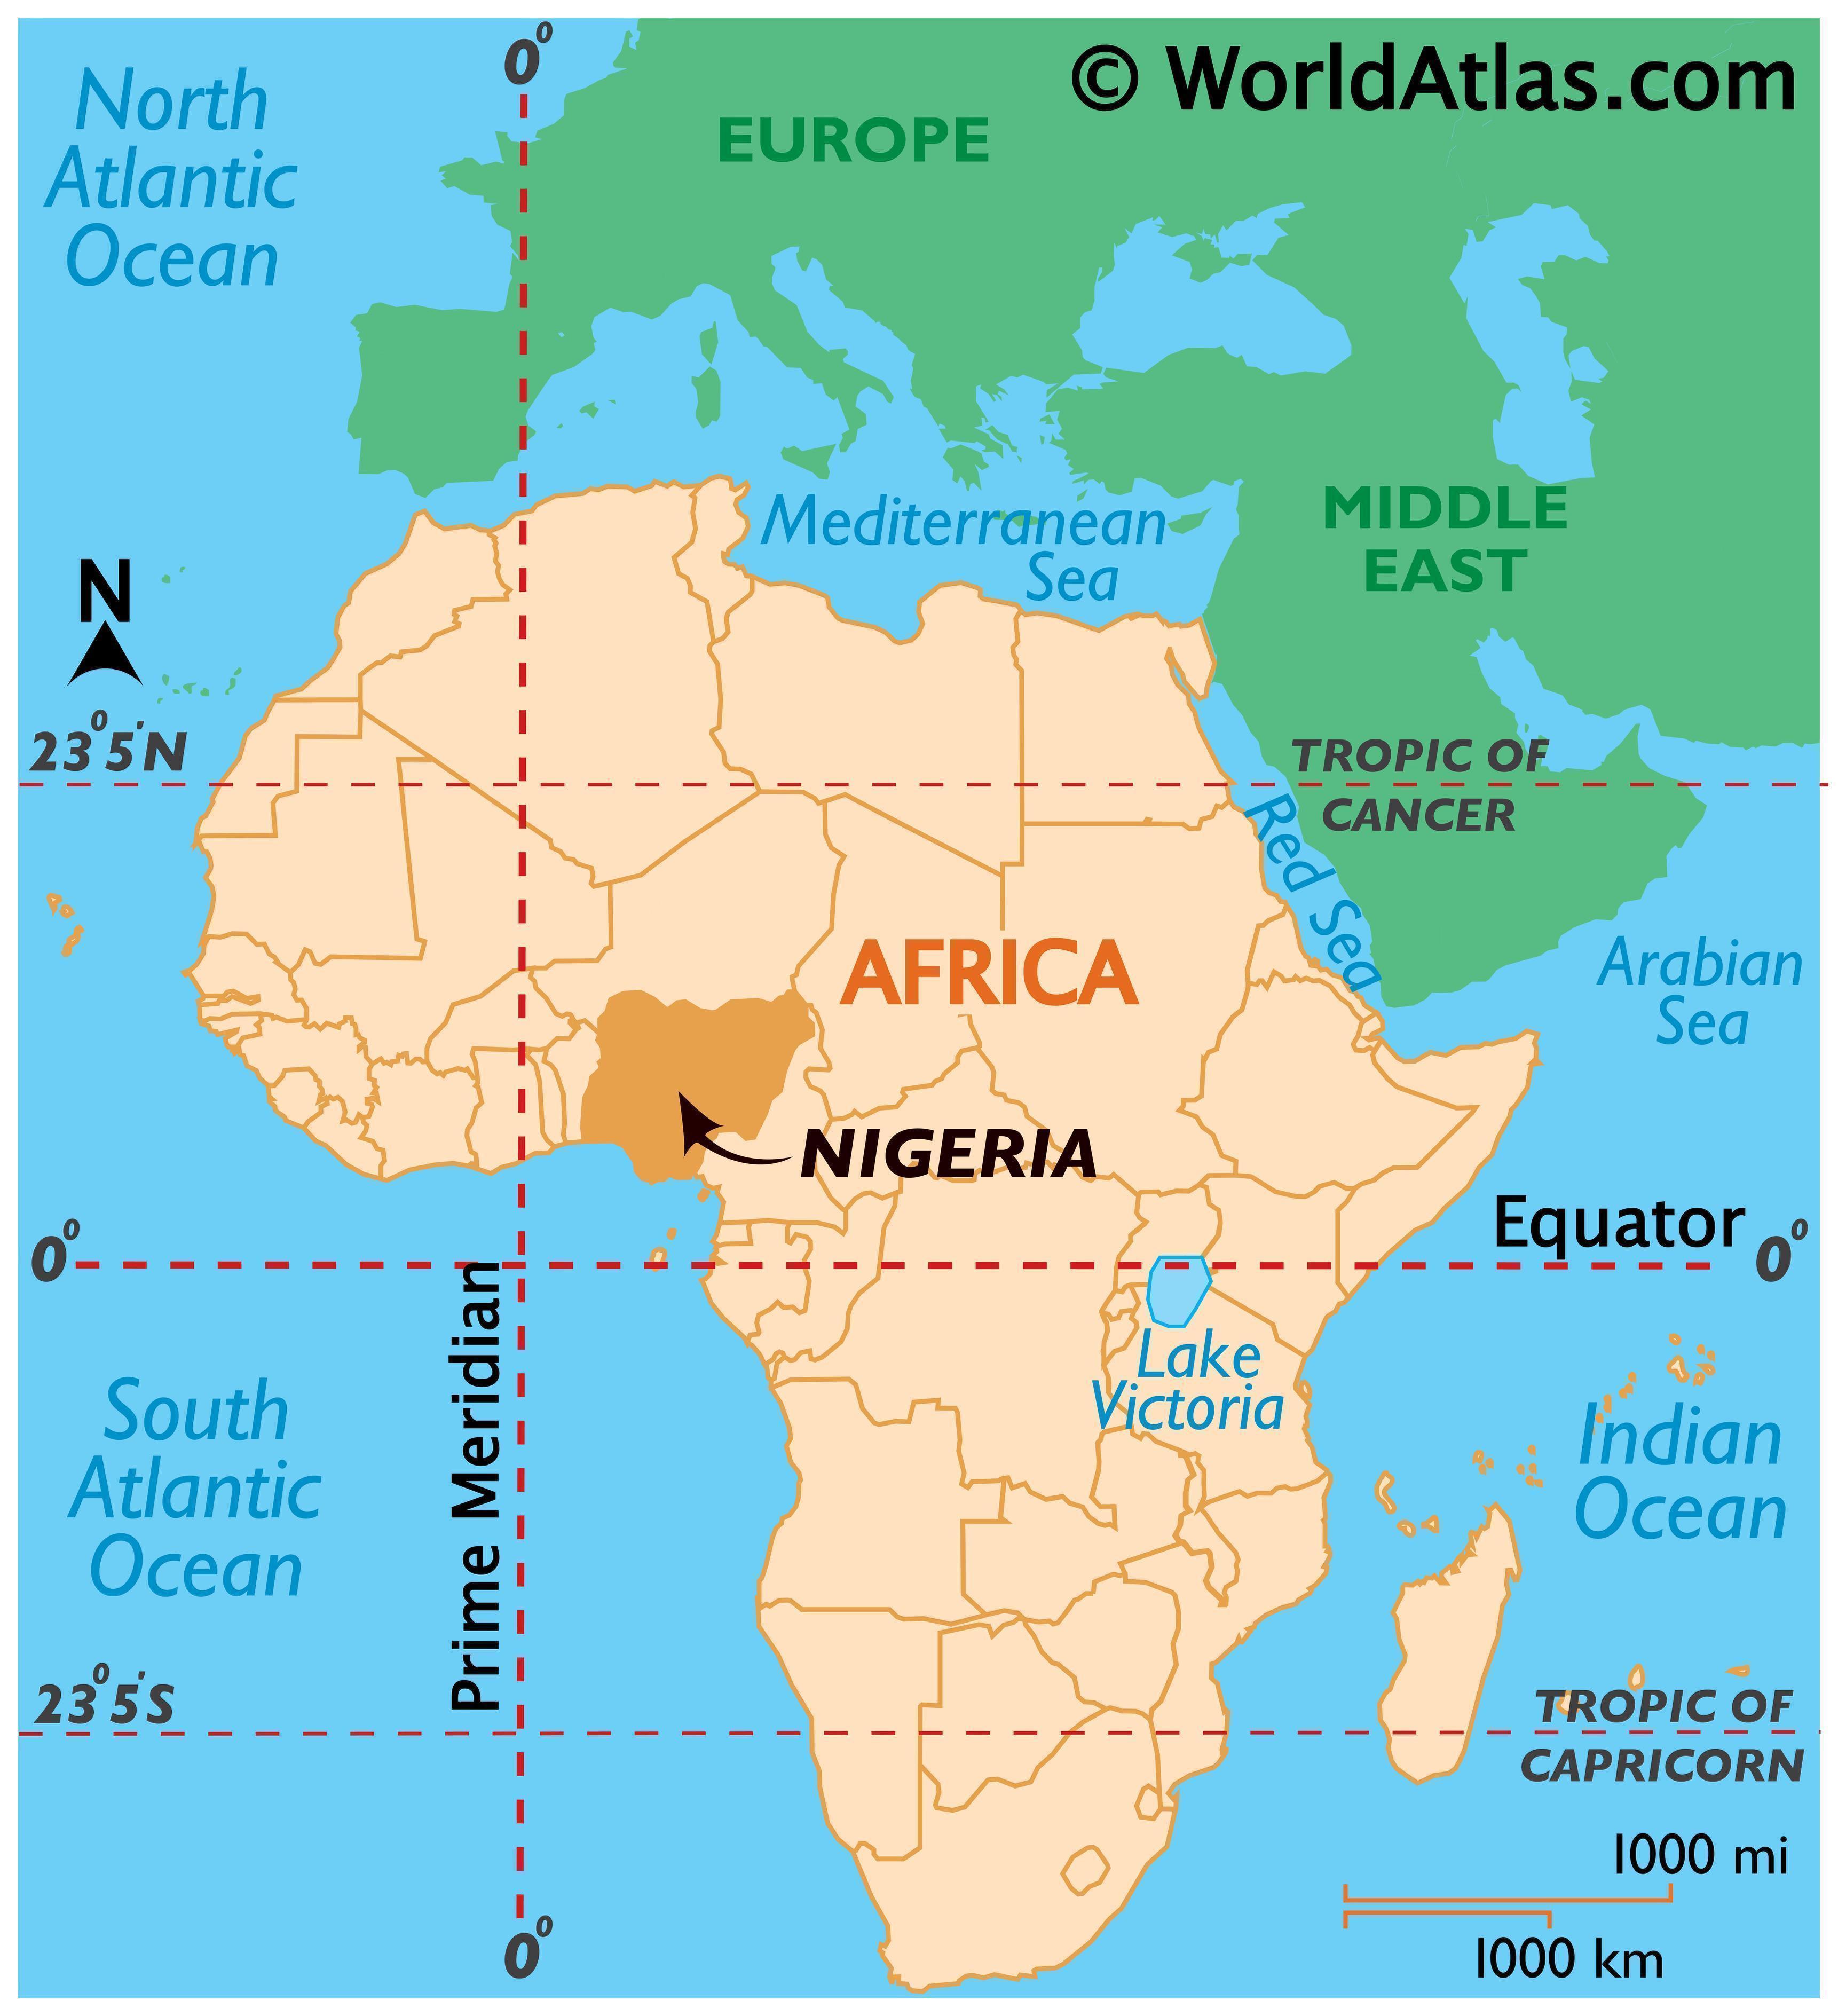 Nigeria Maps & Facts - World Atlas